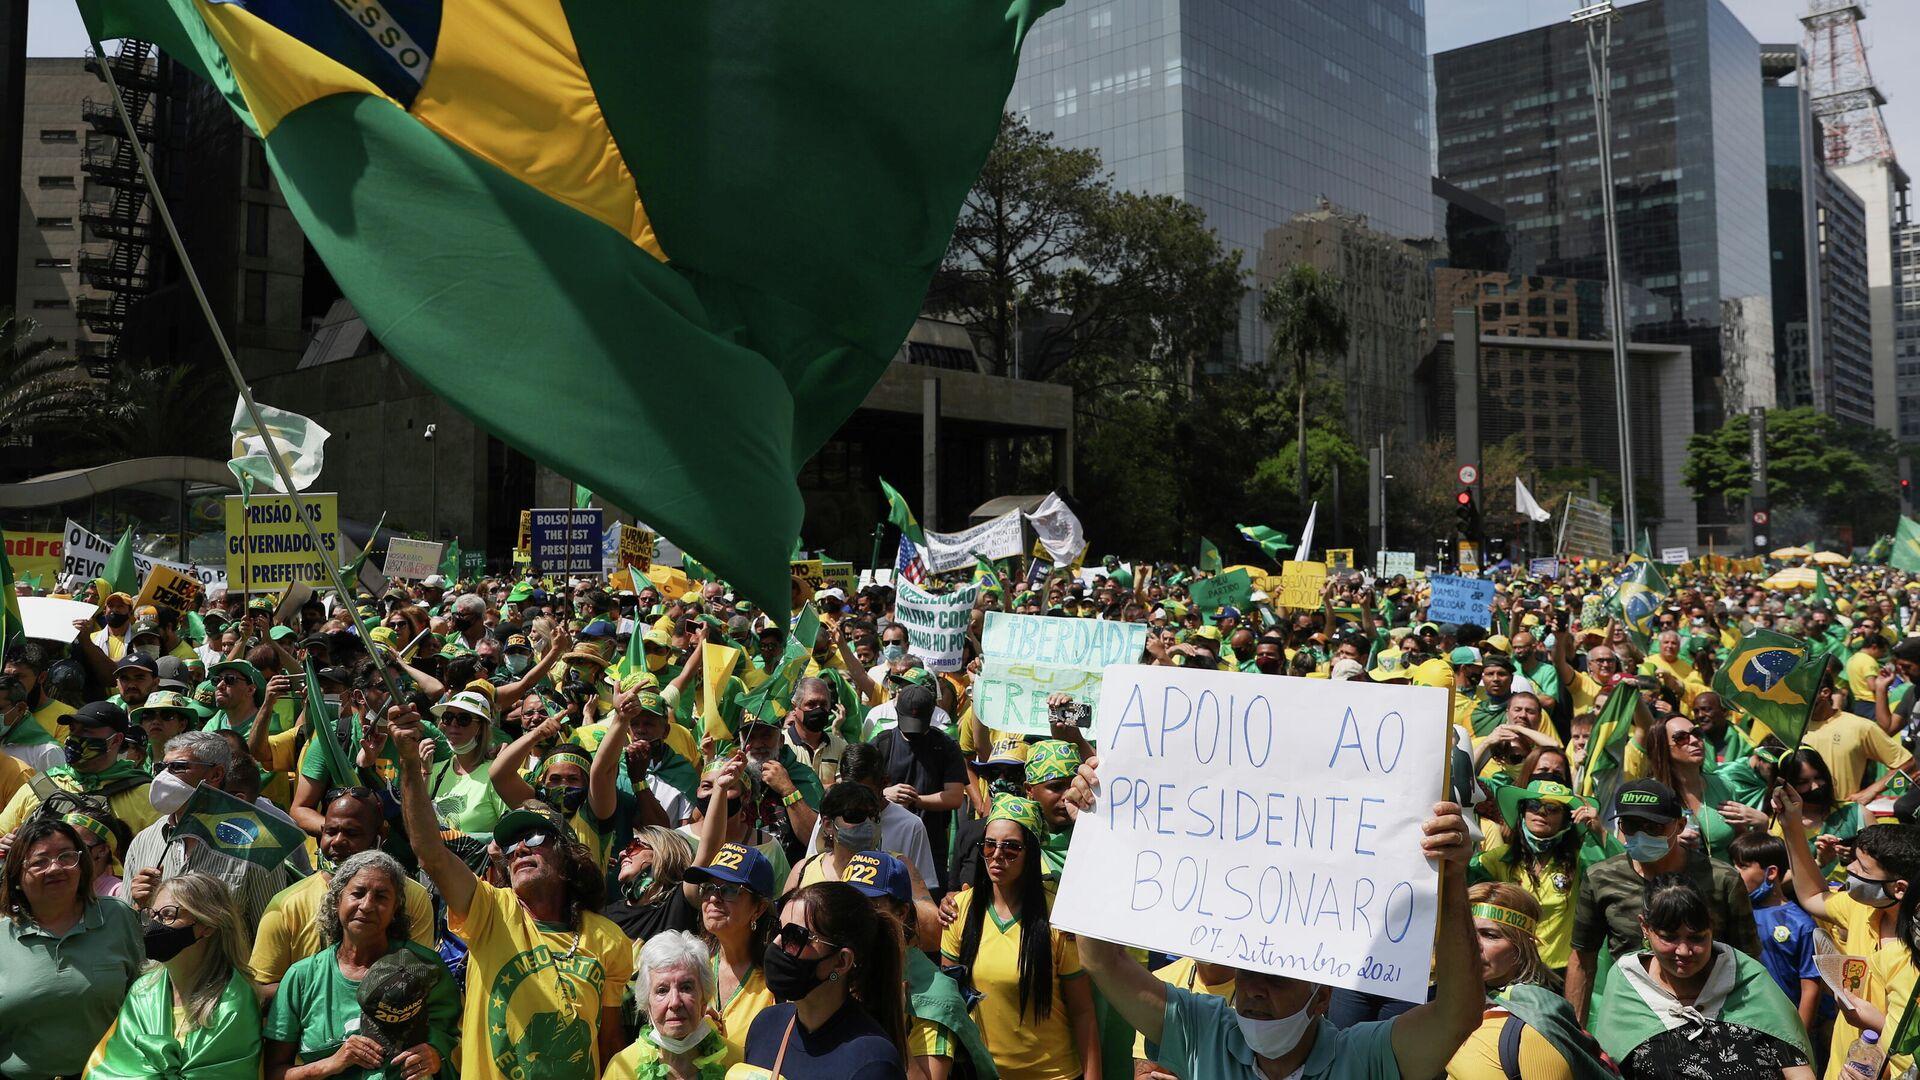 Manifestación a favor del presidente de Brasil Jair Bolsonaro en Sao Paulo, Brasil - Sputnik Mundo, 1920, 15.09.2021